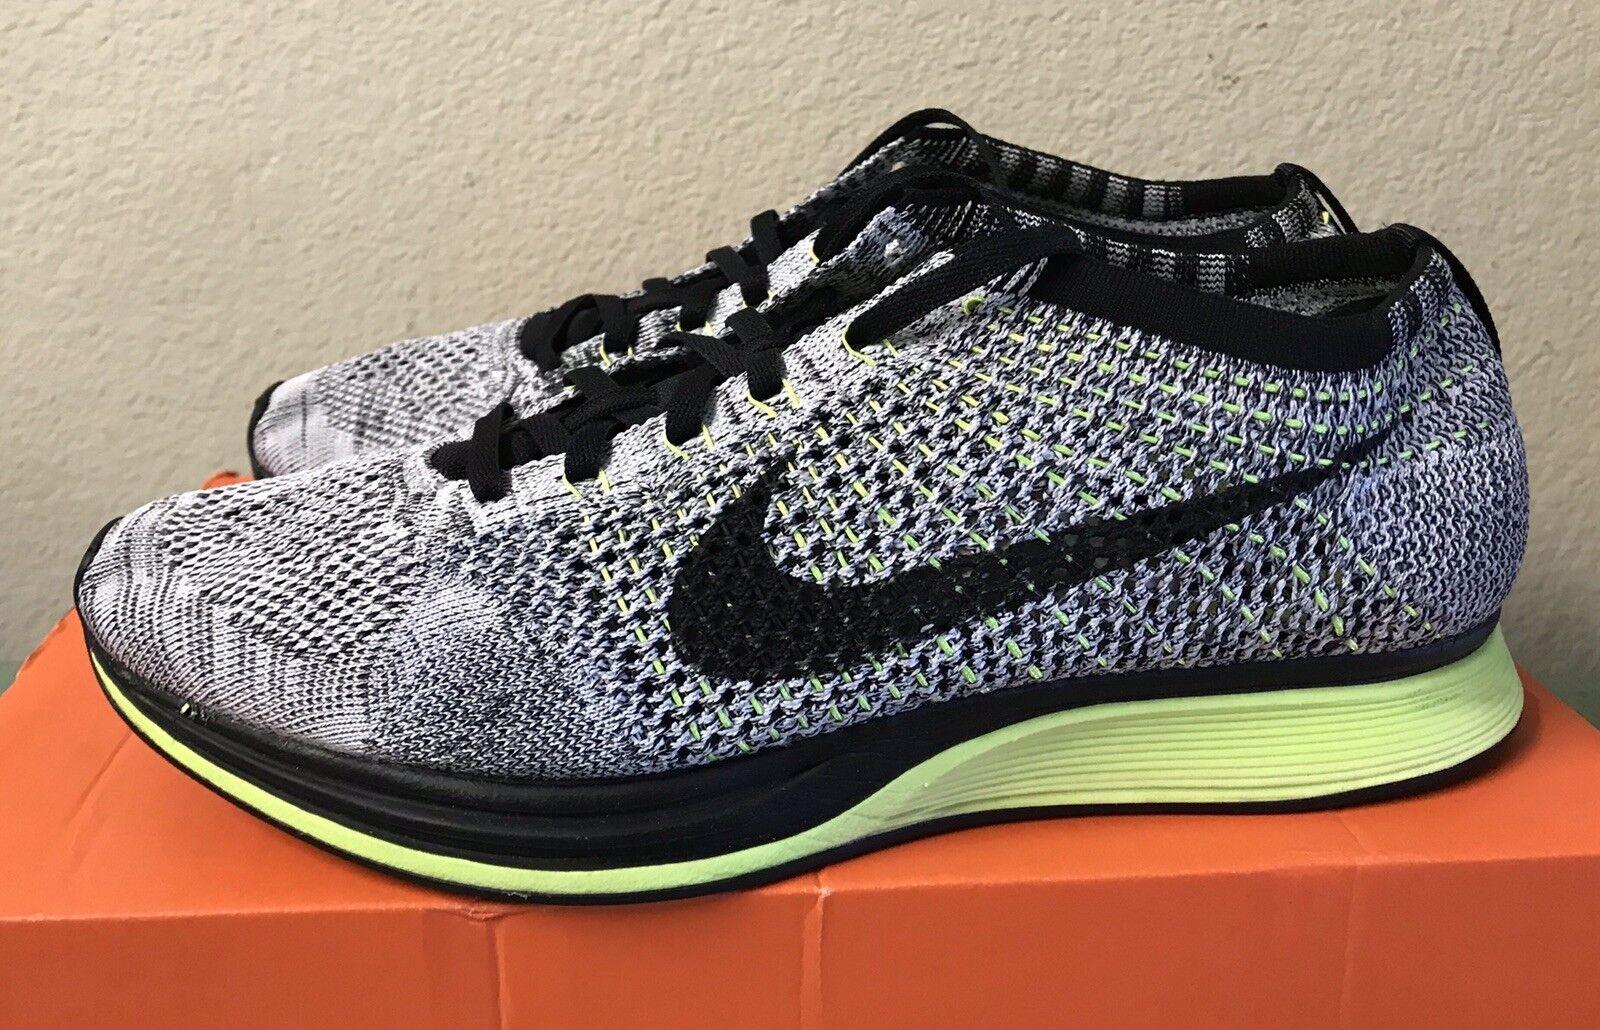 Nike Flyknit Racer Black White Volt Mens Sz 10 Lunar Trainer Running shoes 2014